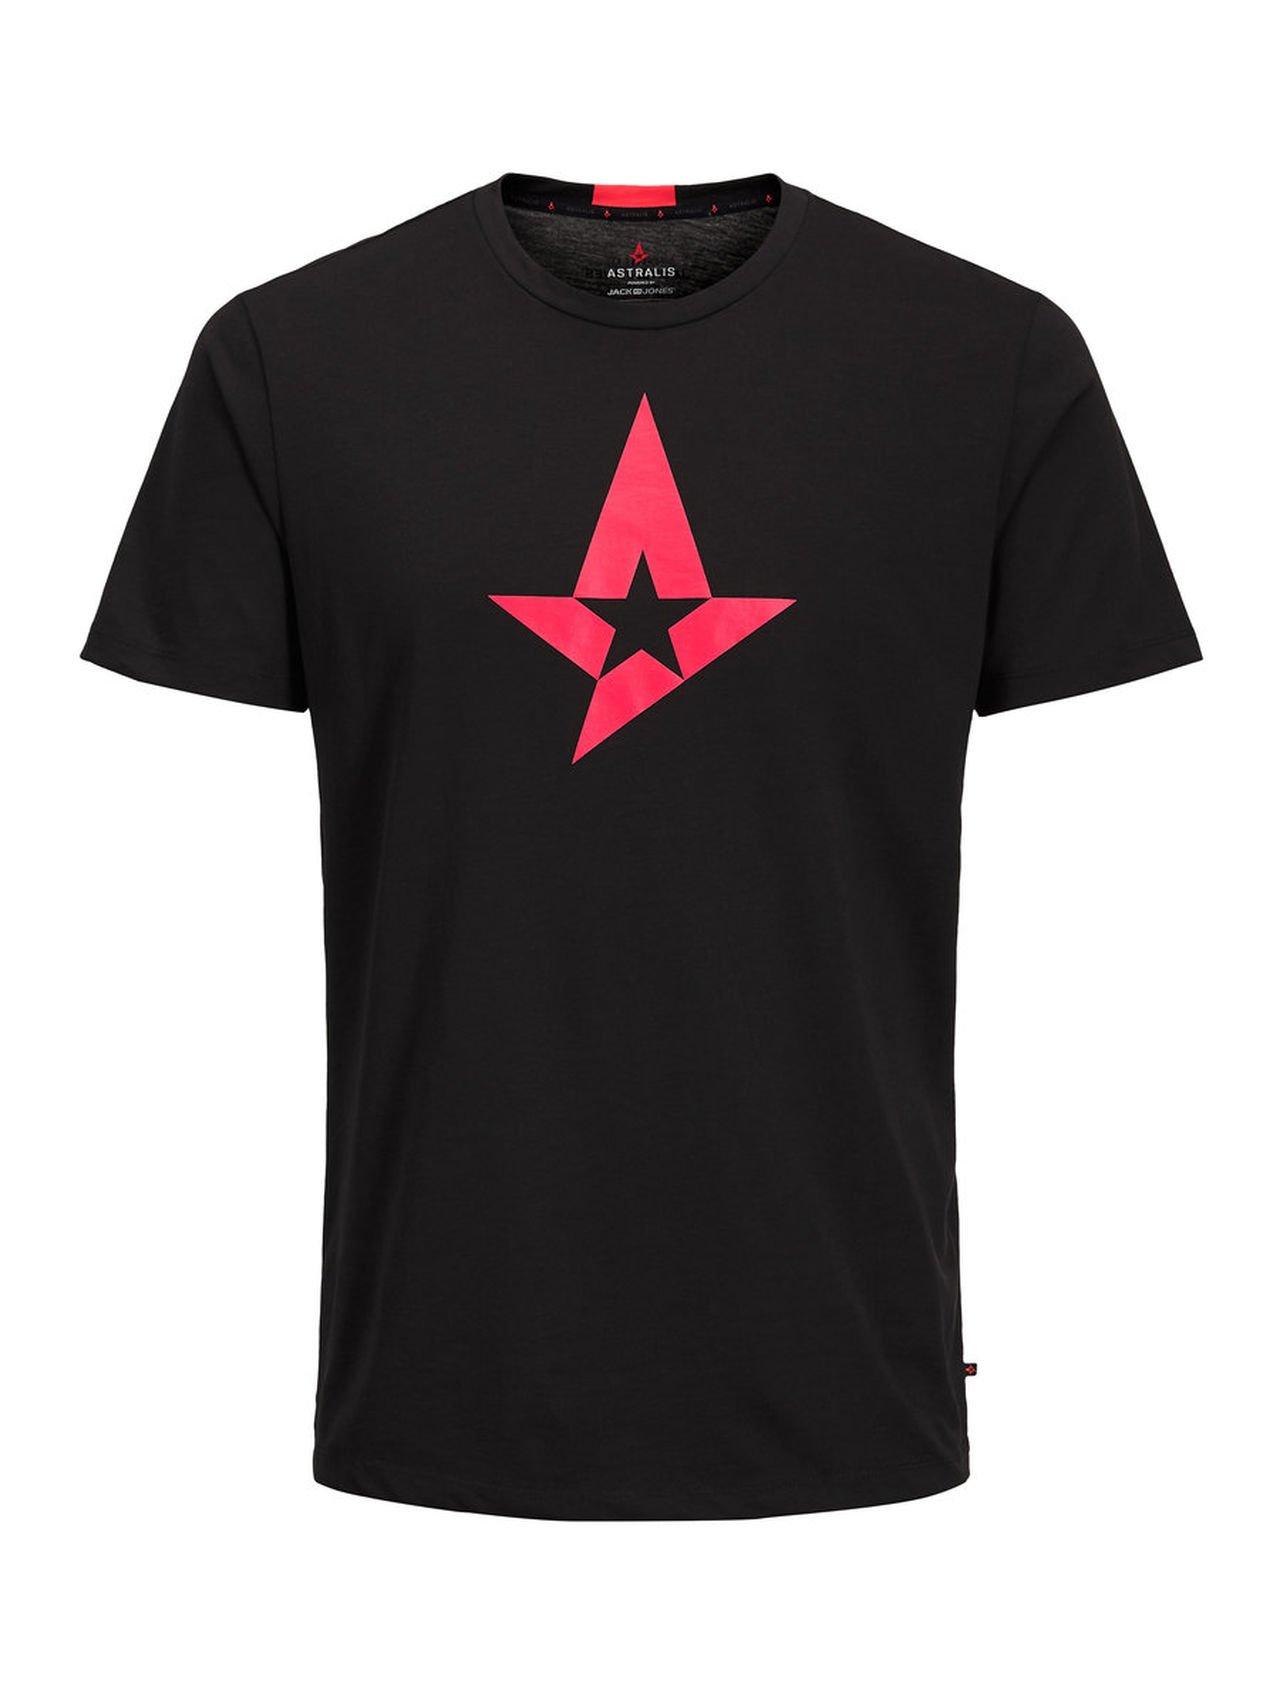 Astralis Merc T-shirt SS - XXL